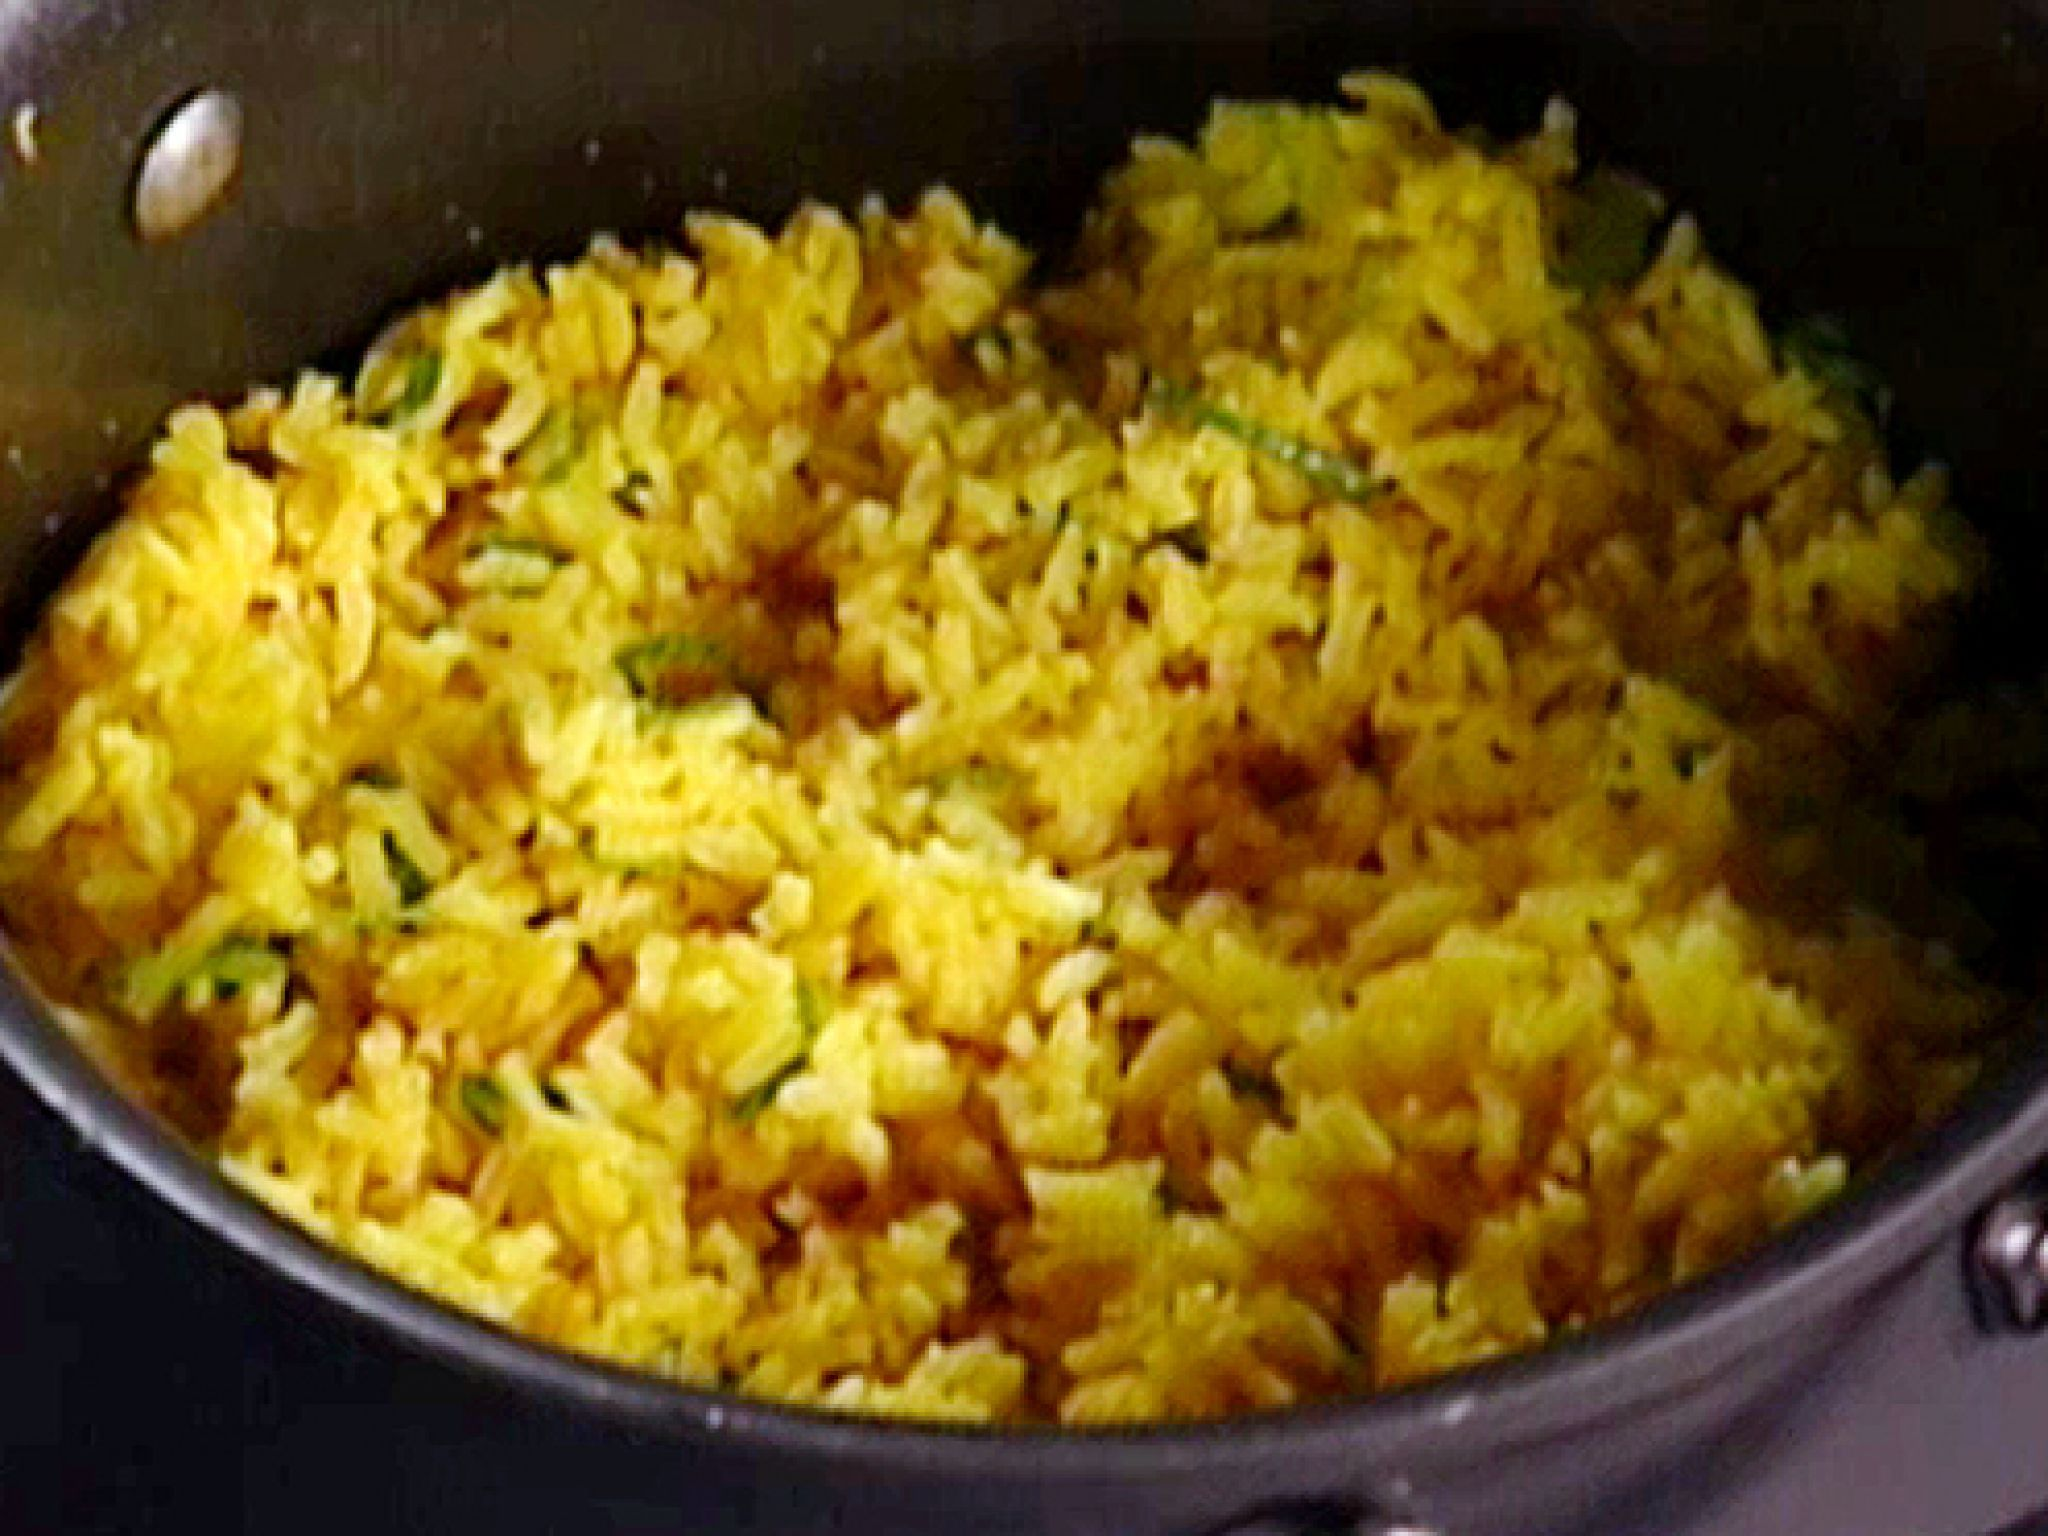 Signature pumpkin pie recipe yellow rice recipes yellow rice recipe box forumfinder Images